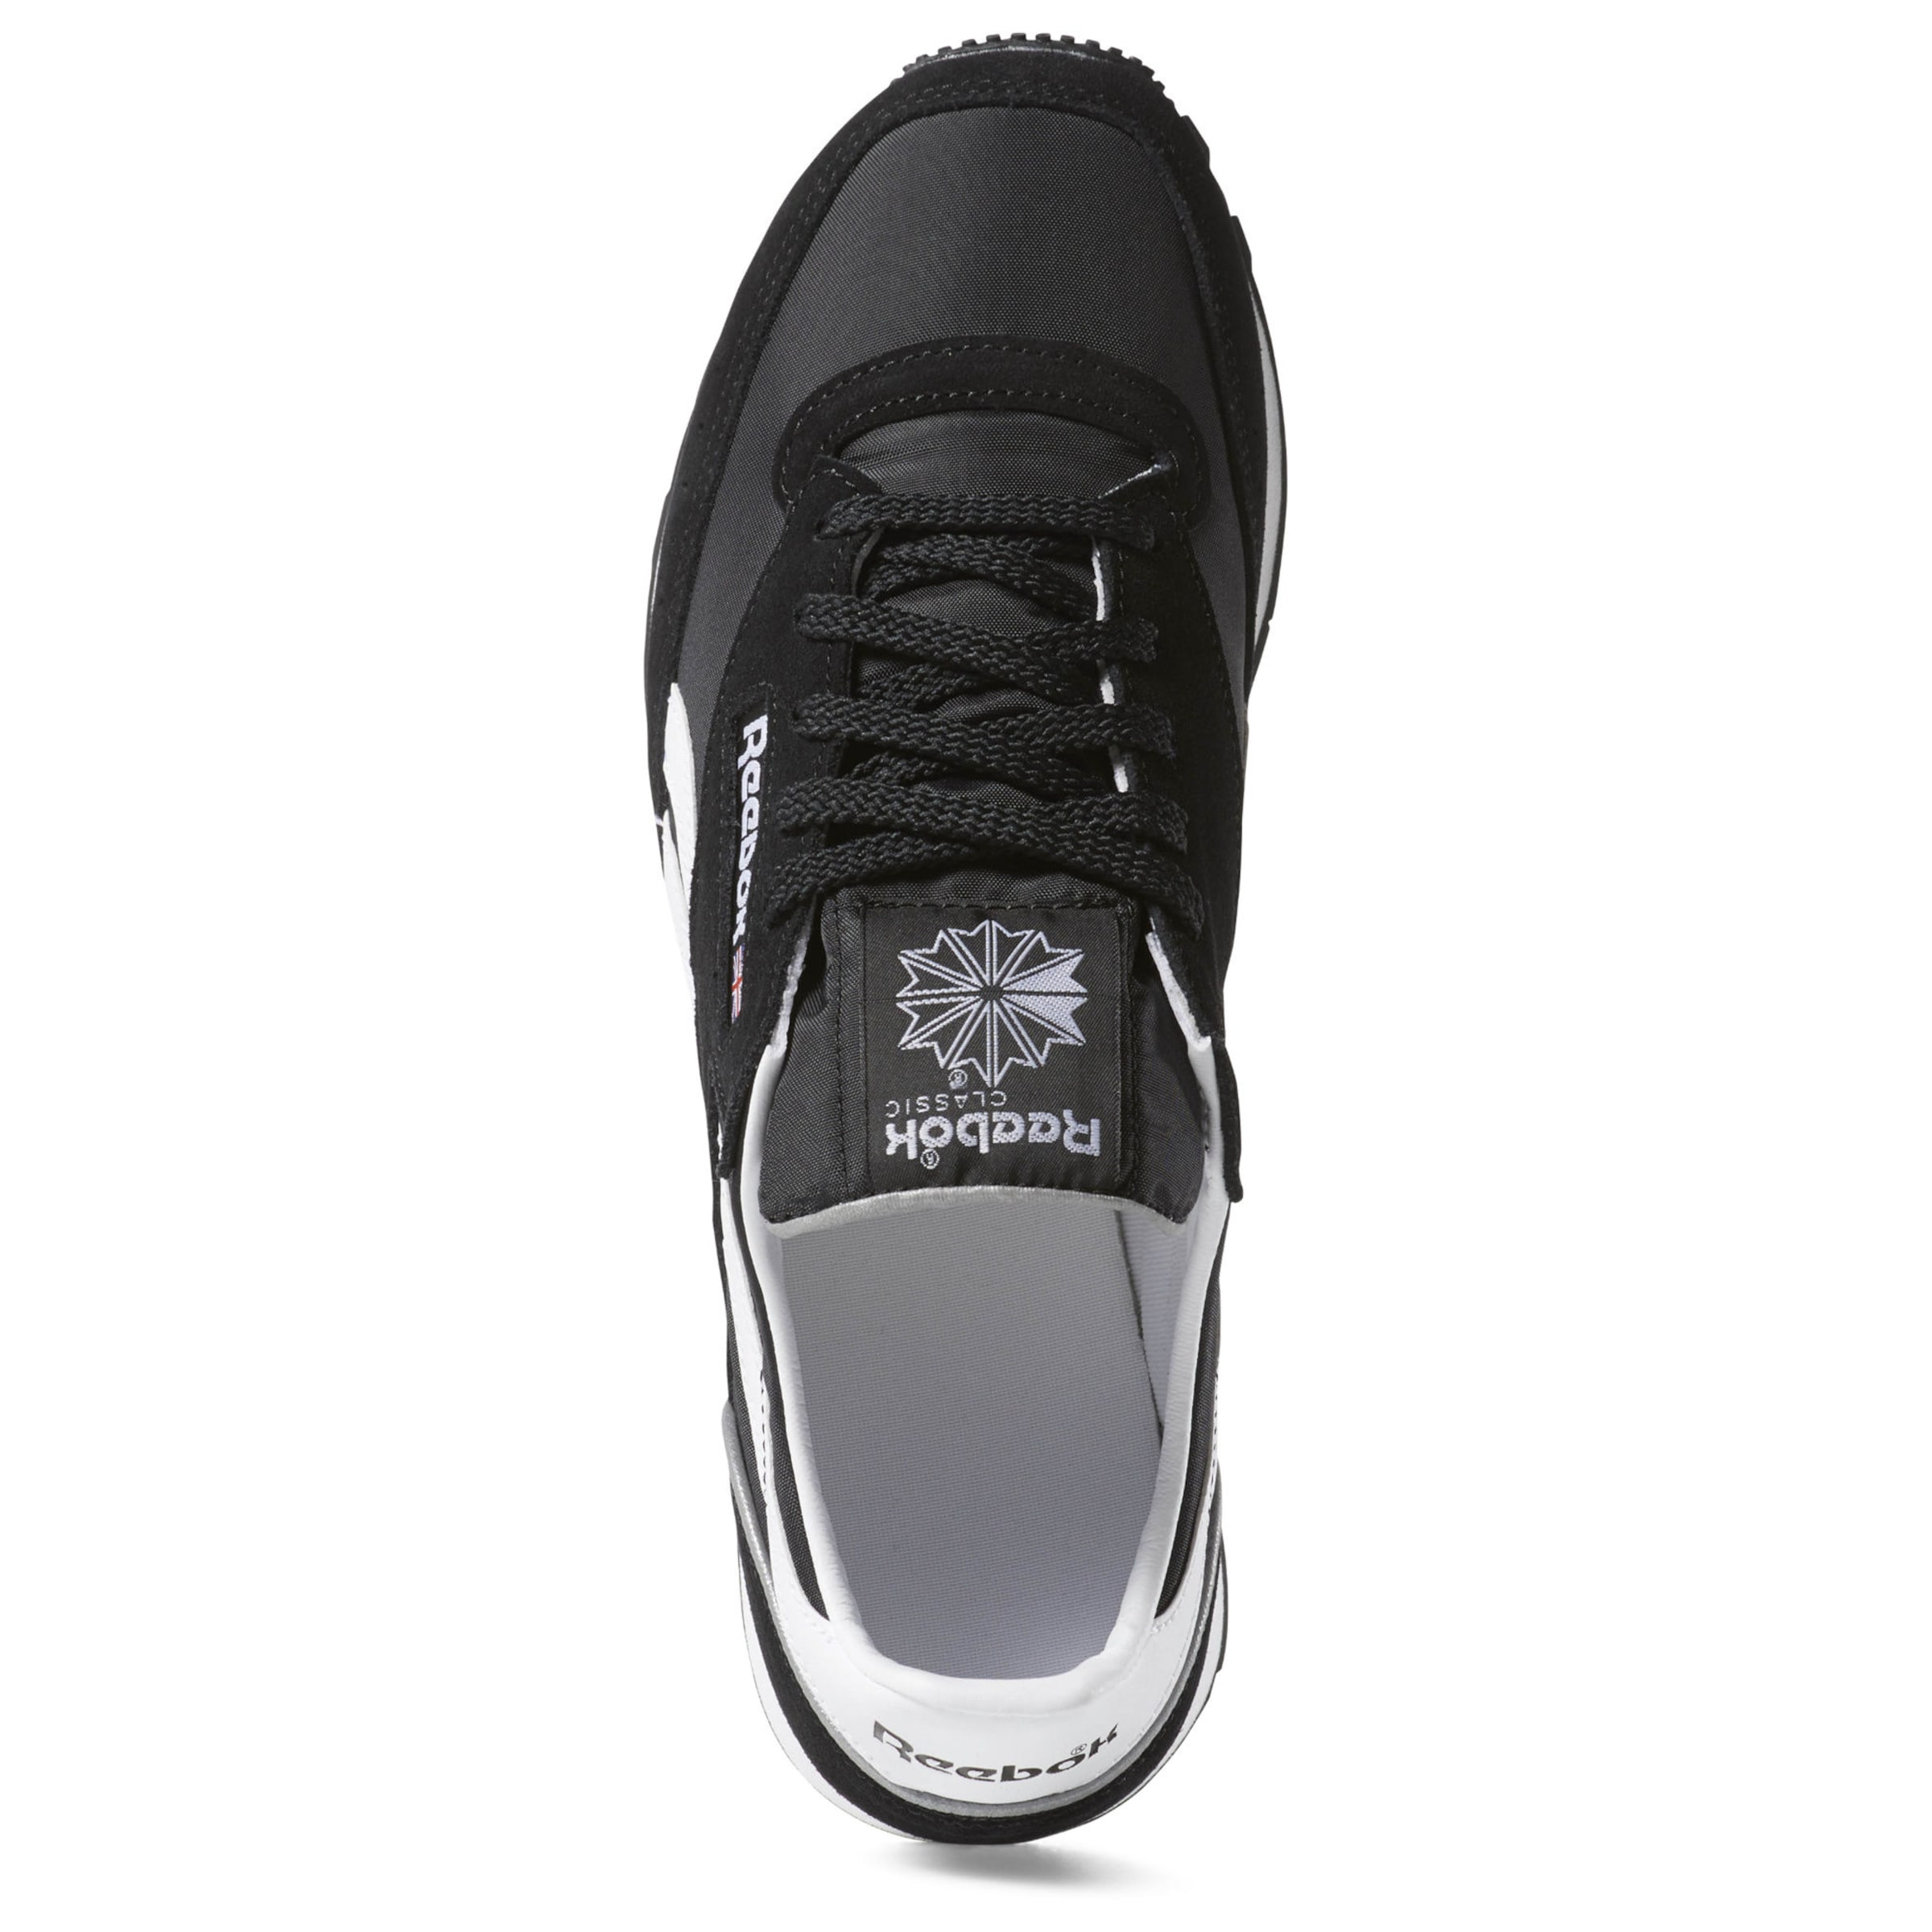 Reebok classic Schuhe Nylon, Nylon, Nylon, Leder Bequem, gut aussehend 909d6c